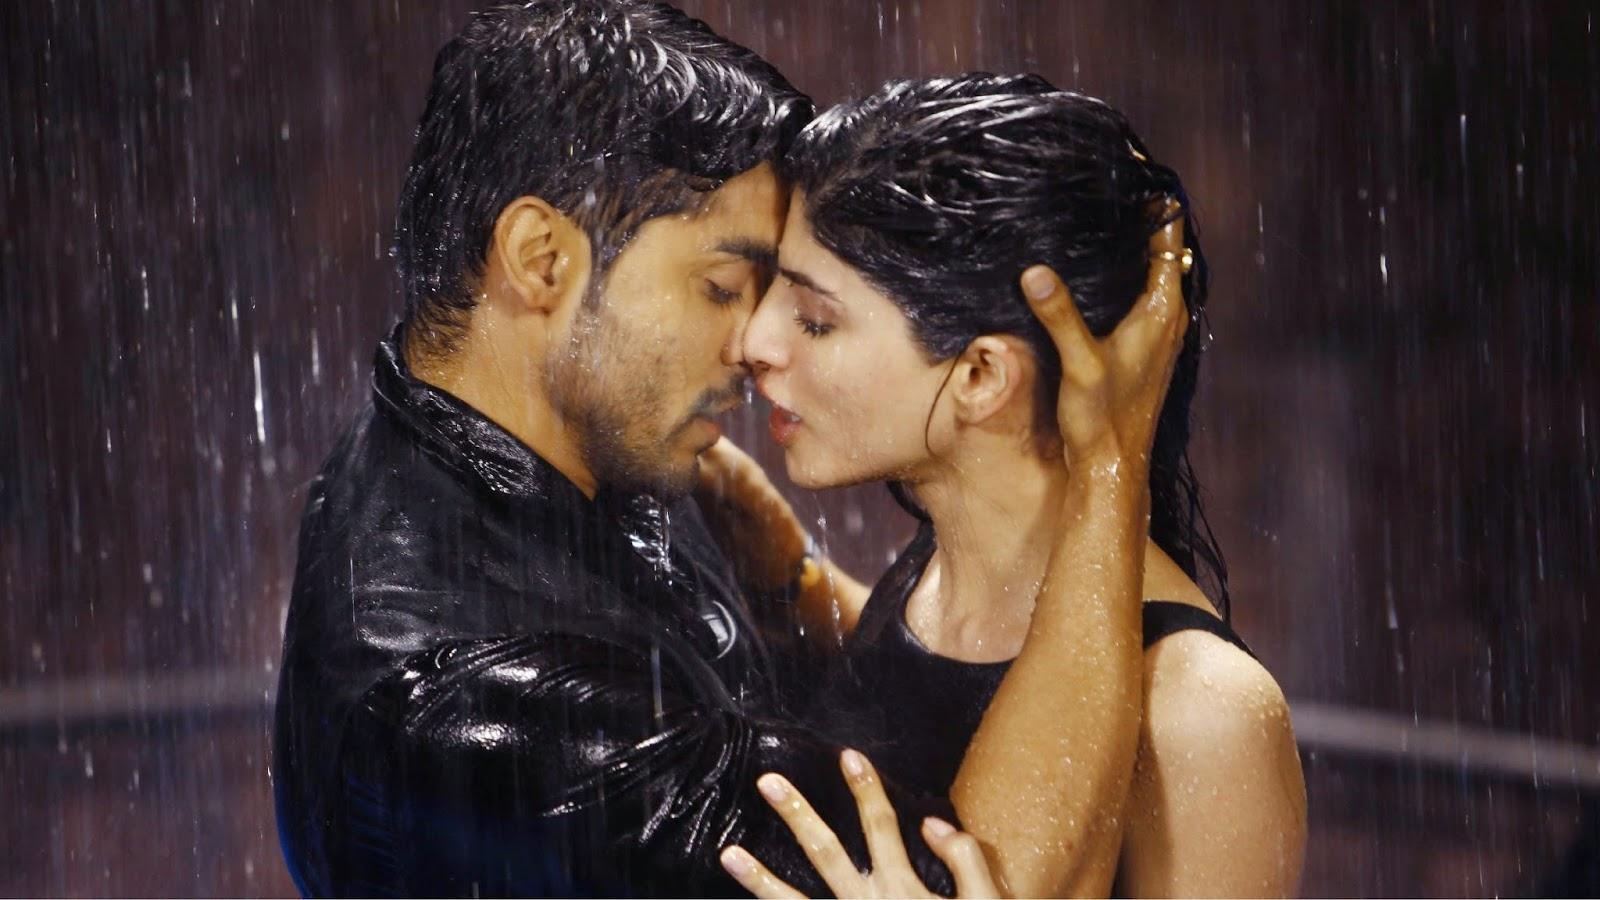 Telugu movies hd video songs 2015 - Bleach episode 338 download